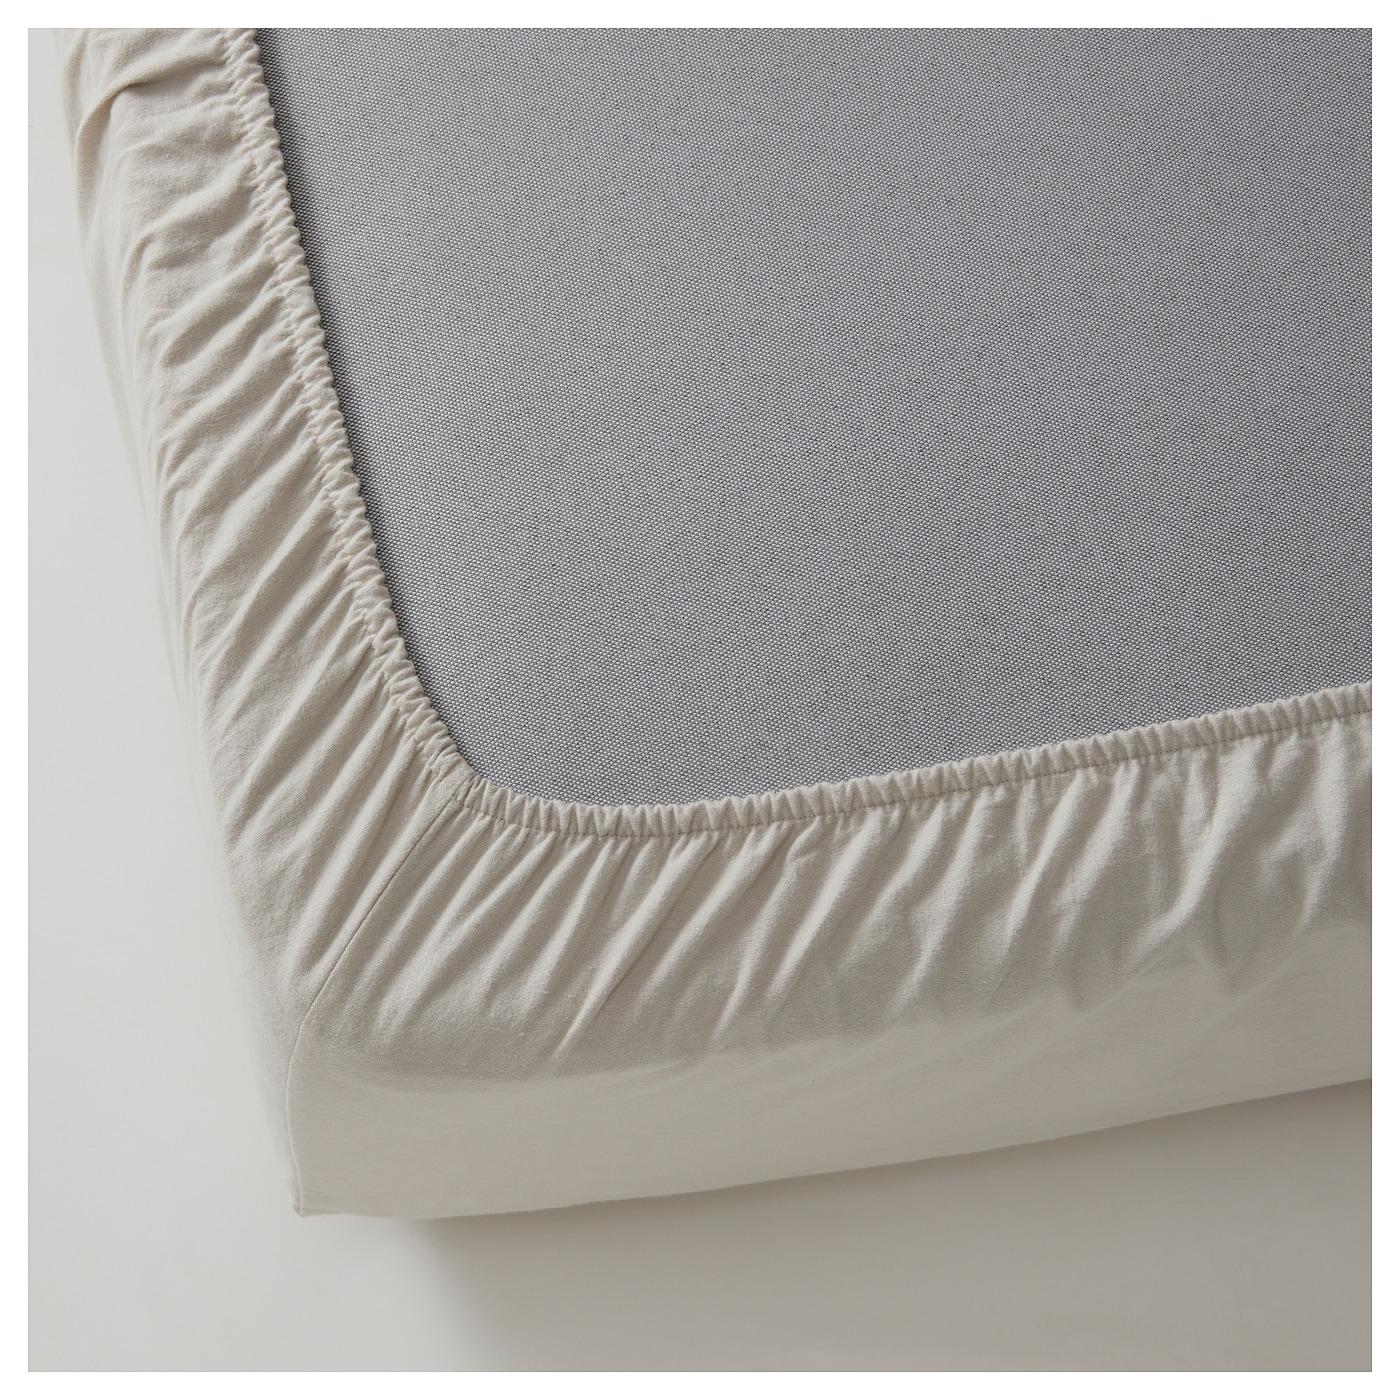 bl suga drap housse gris clair 180x200 cm ikea. Black Bedroom Furniture Sets. Home Design Ideas